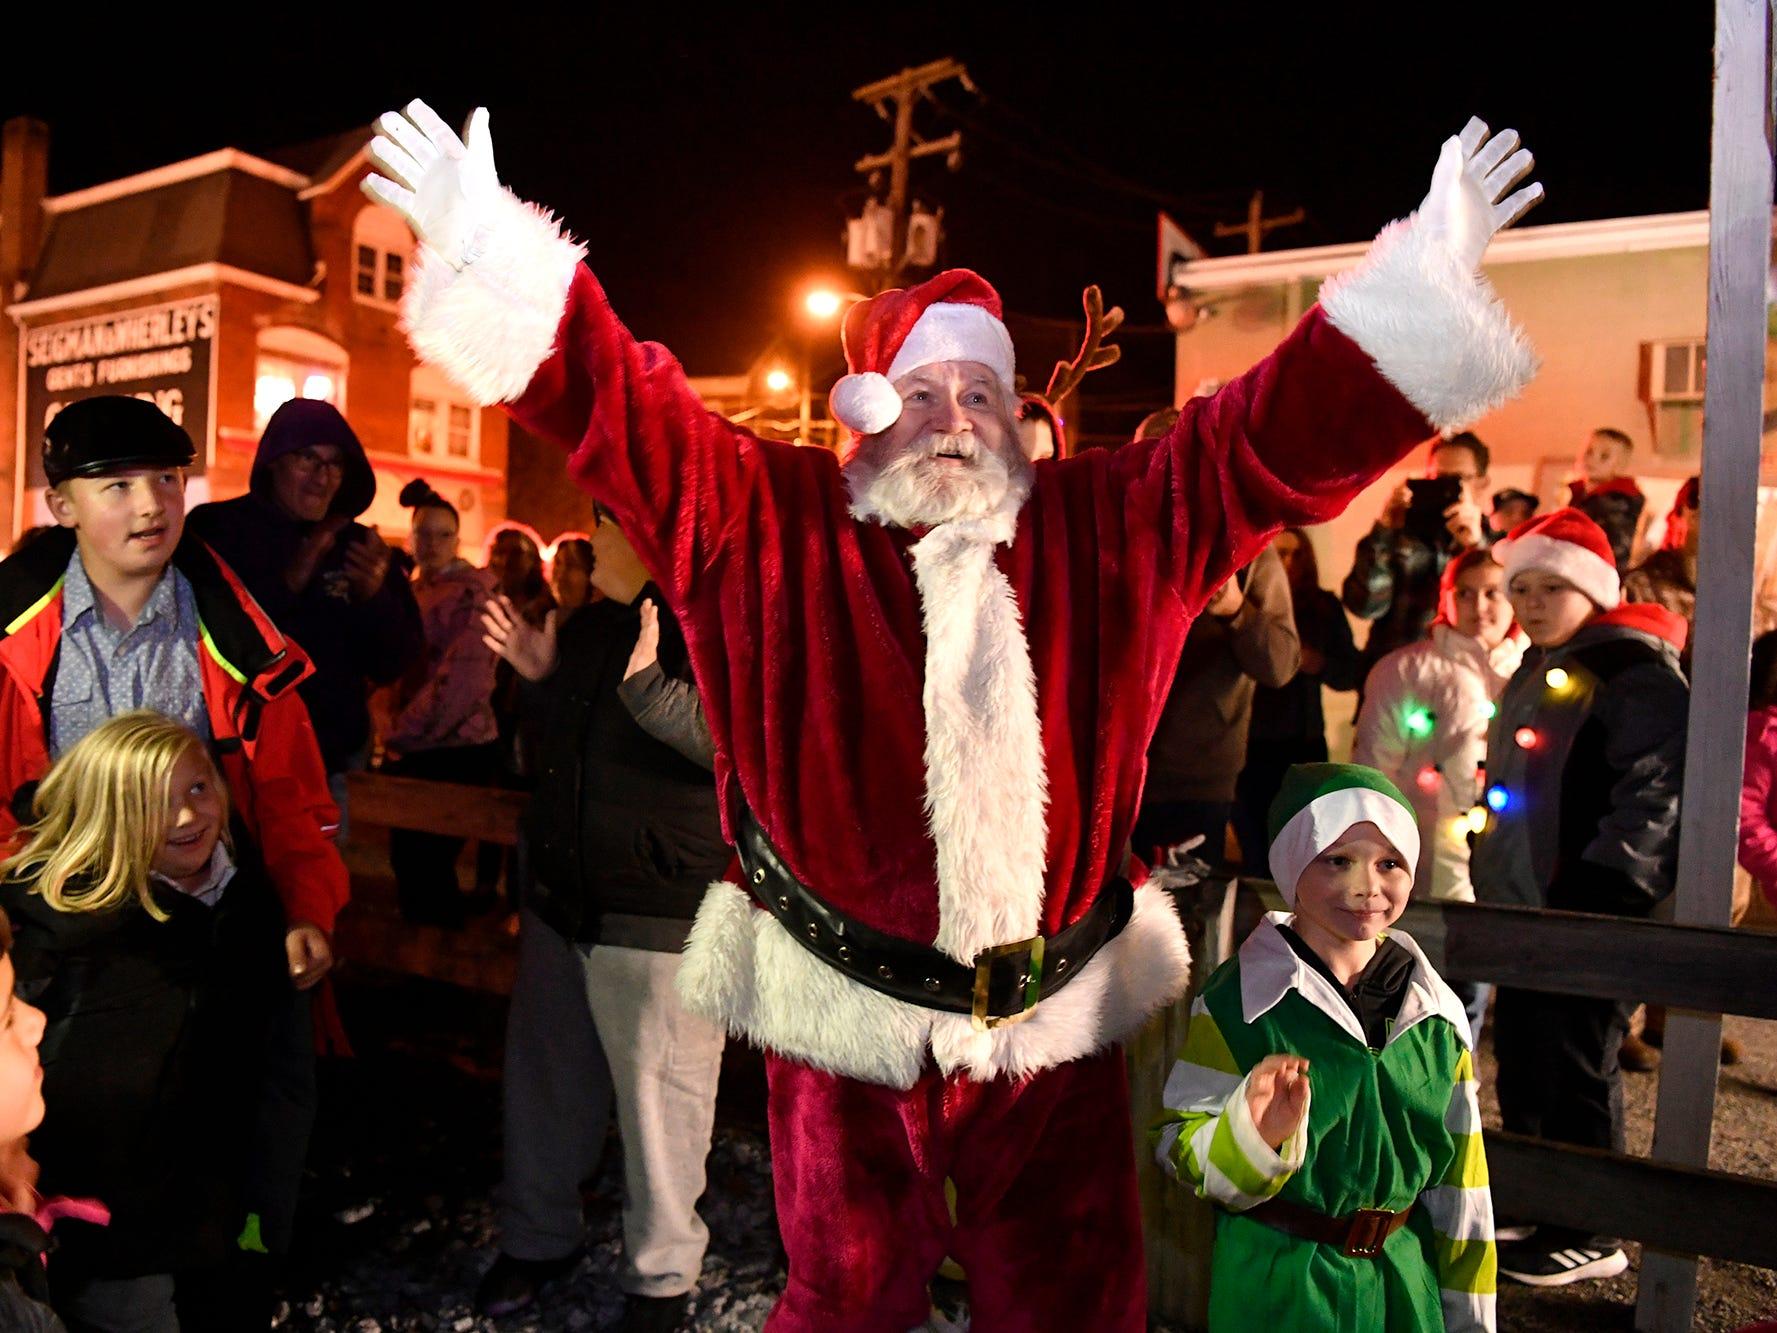 Santa arrives for the annual tree lighting in Glen Rock, Sunday, November 25, 2018. John A. Pavoncello photo